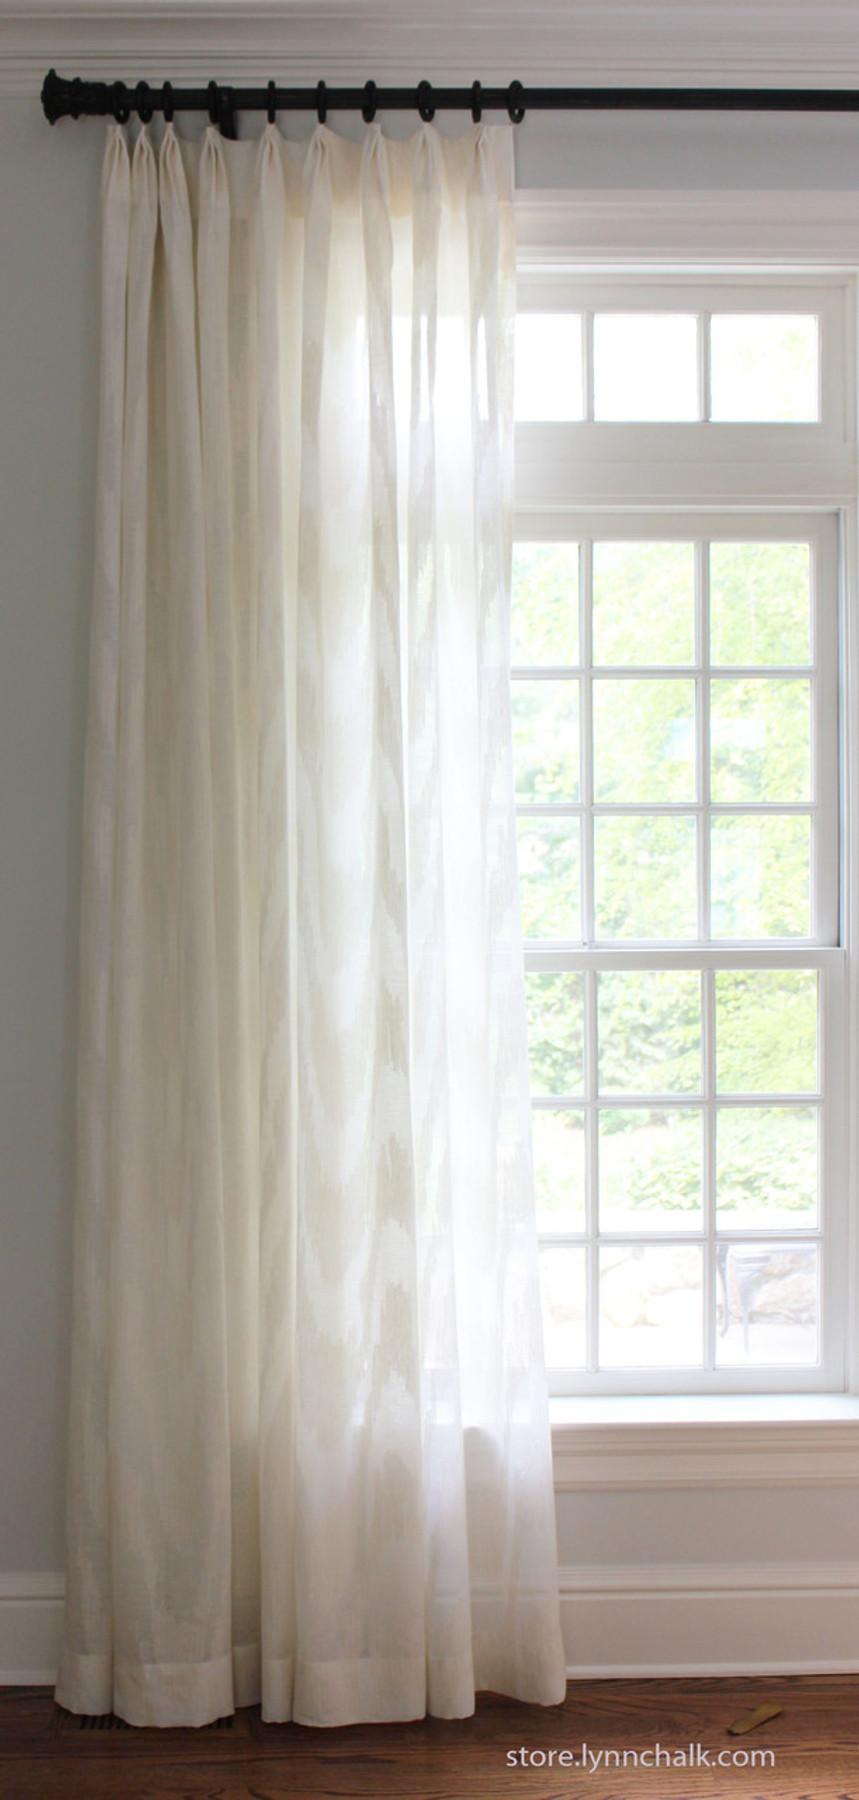 custom sheer drapes by lynn chalk in cowtan u0026 tout marina in - Sheer Drapes